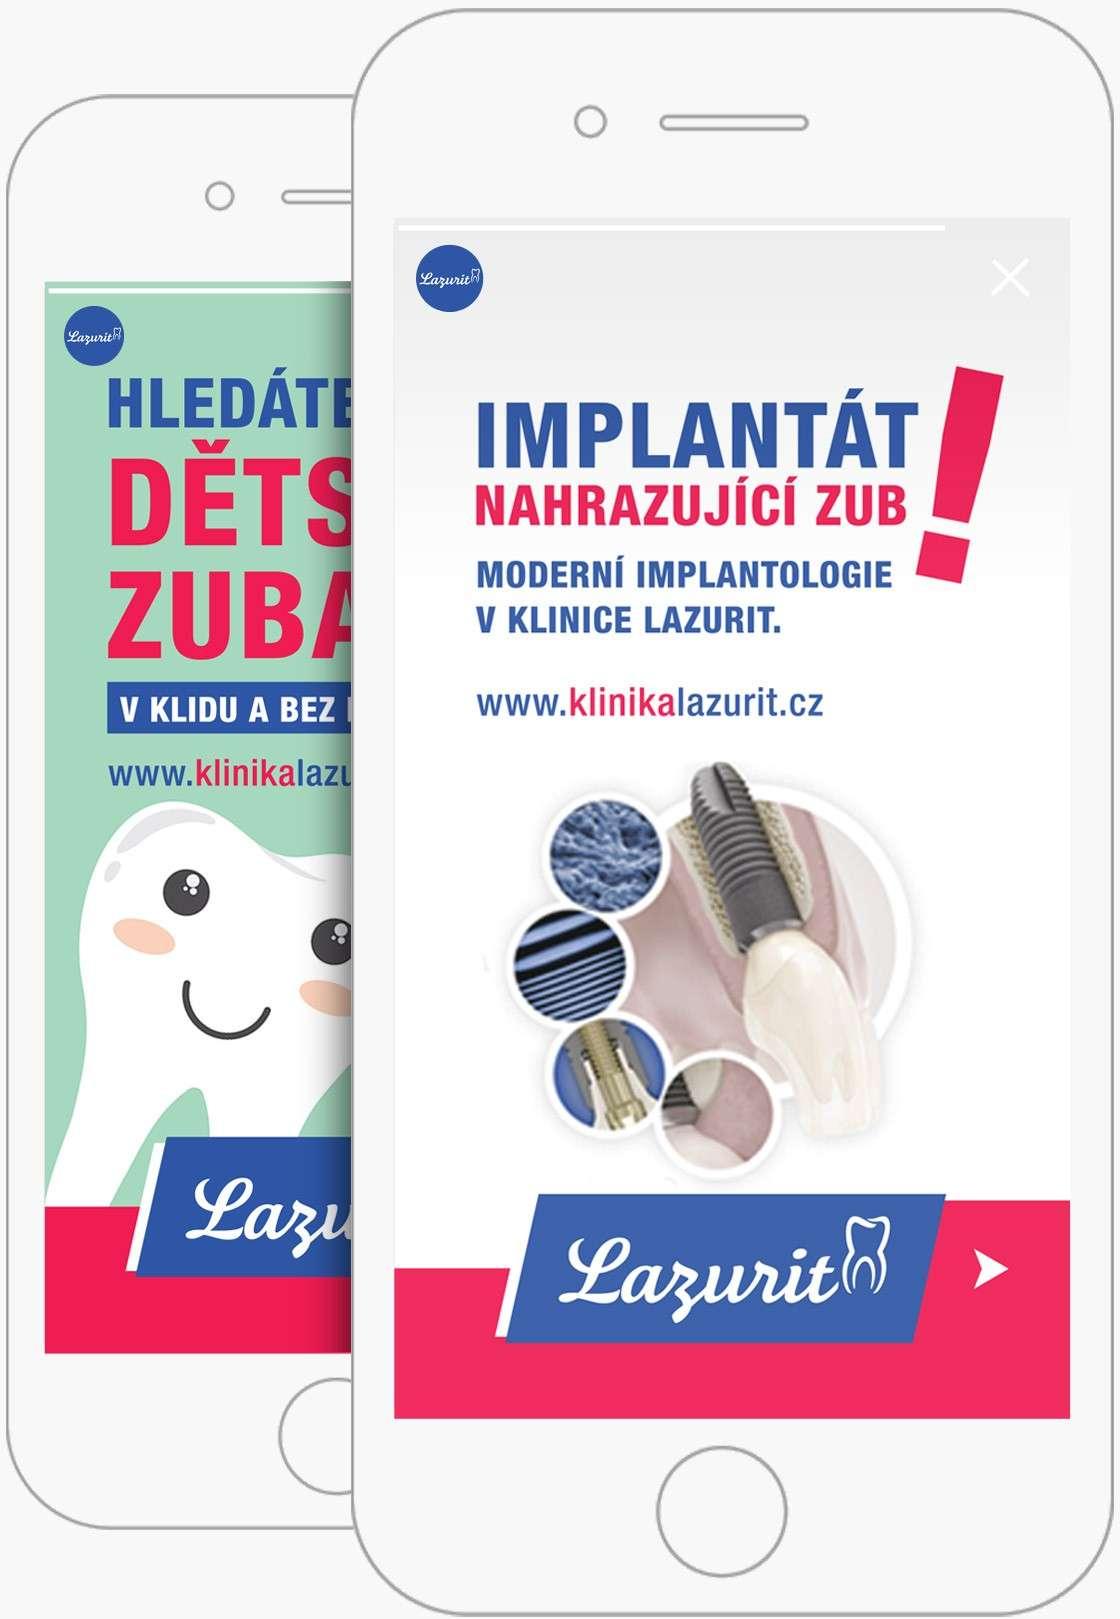 clubadvisor_reference_klinika-lazurit_on-line-marketing_instagram